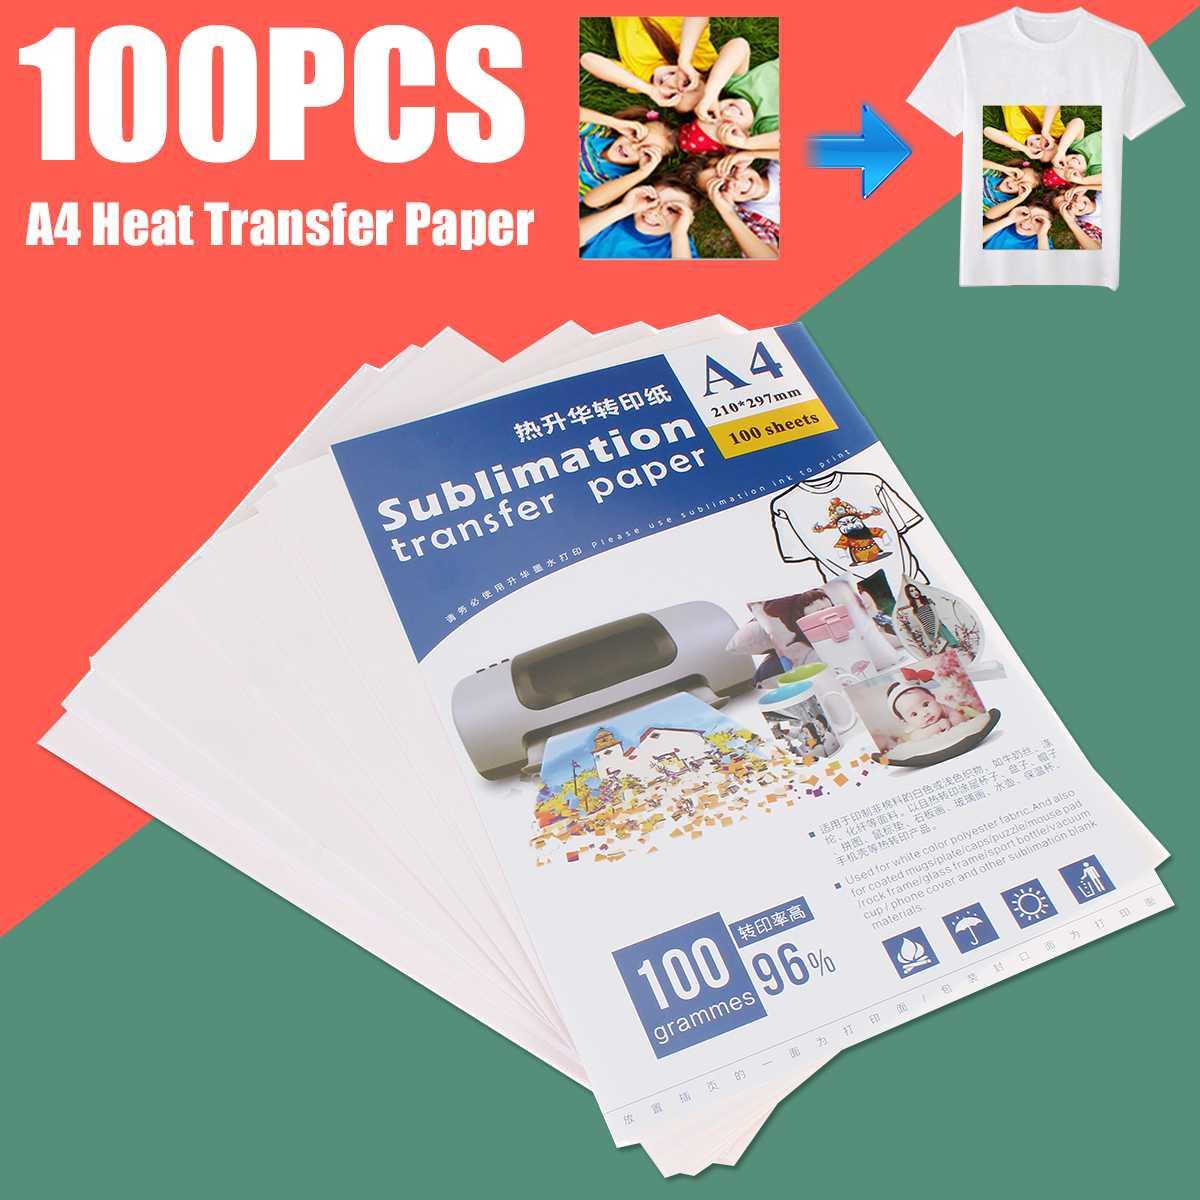 100pcs A4 Heat Transfer Paper for T-shirt Printing Ironing Hot Stamping Machine Lamp/Dark Transfer Paper